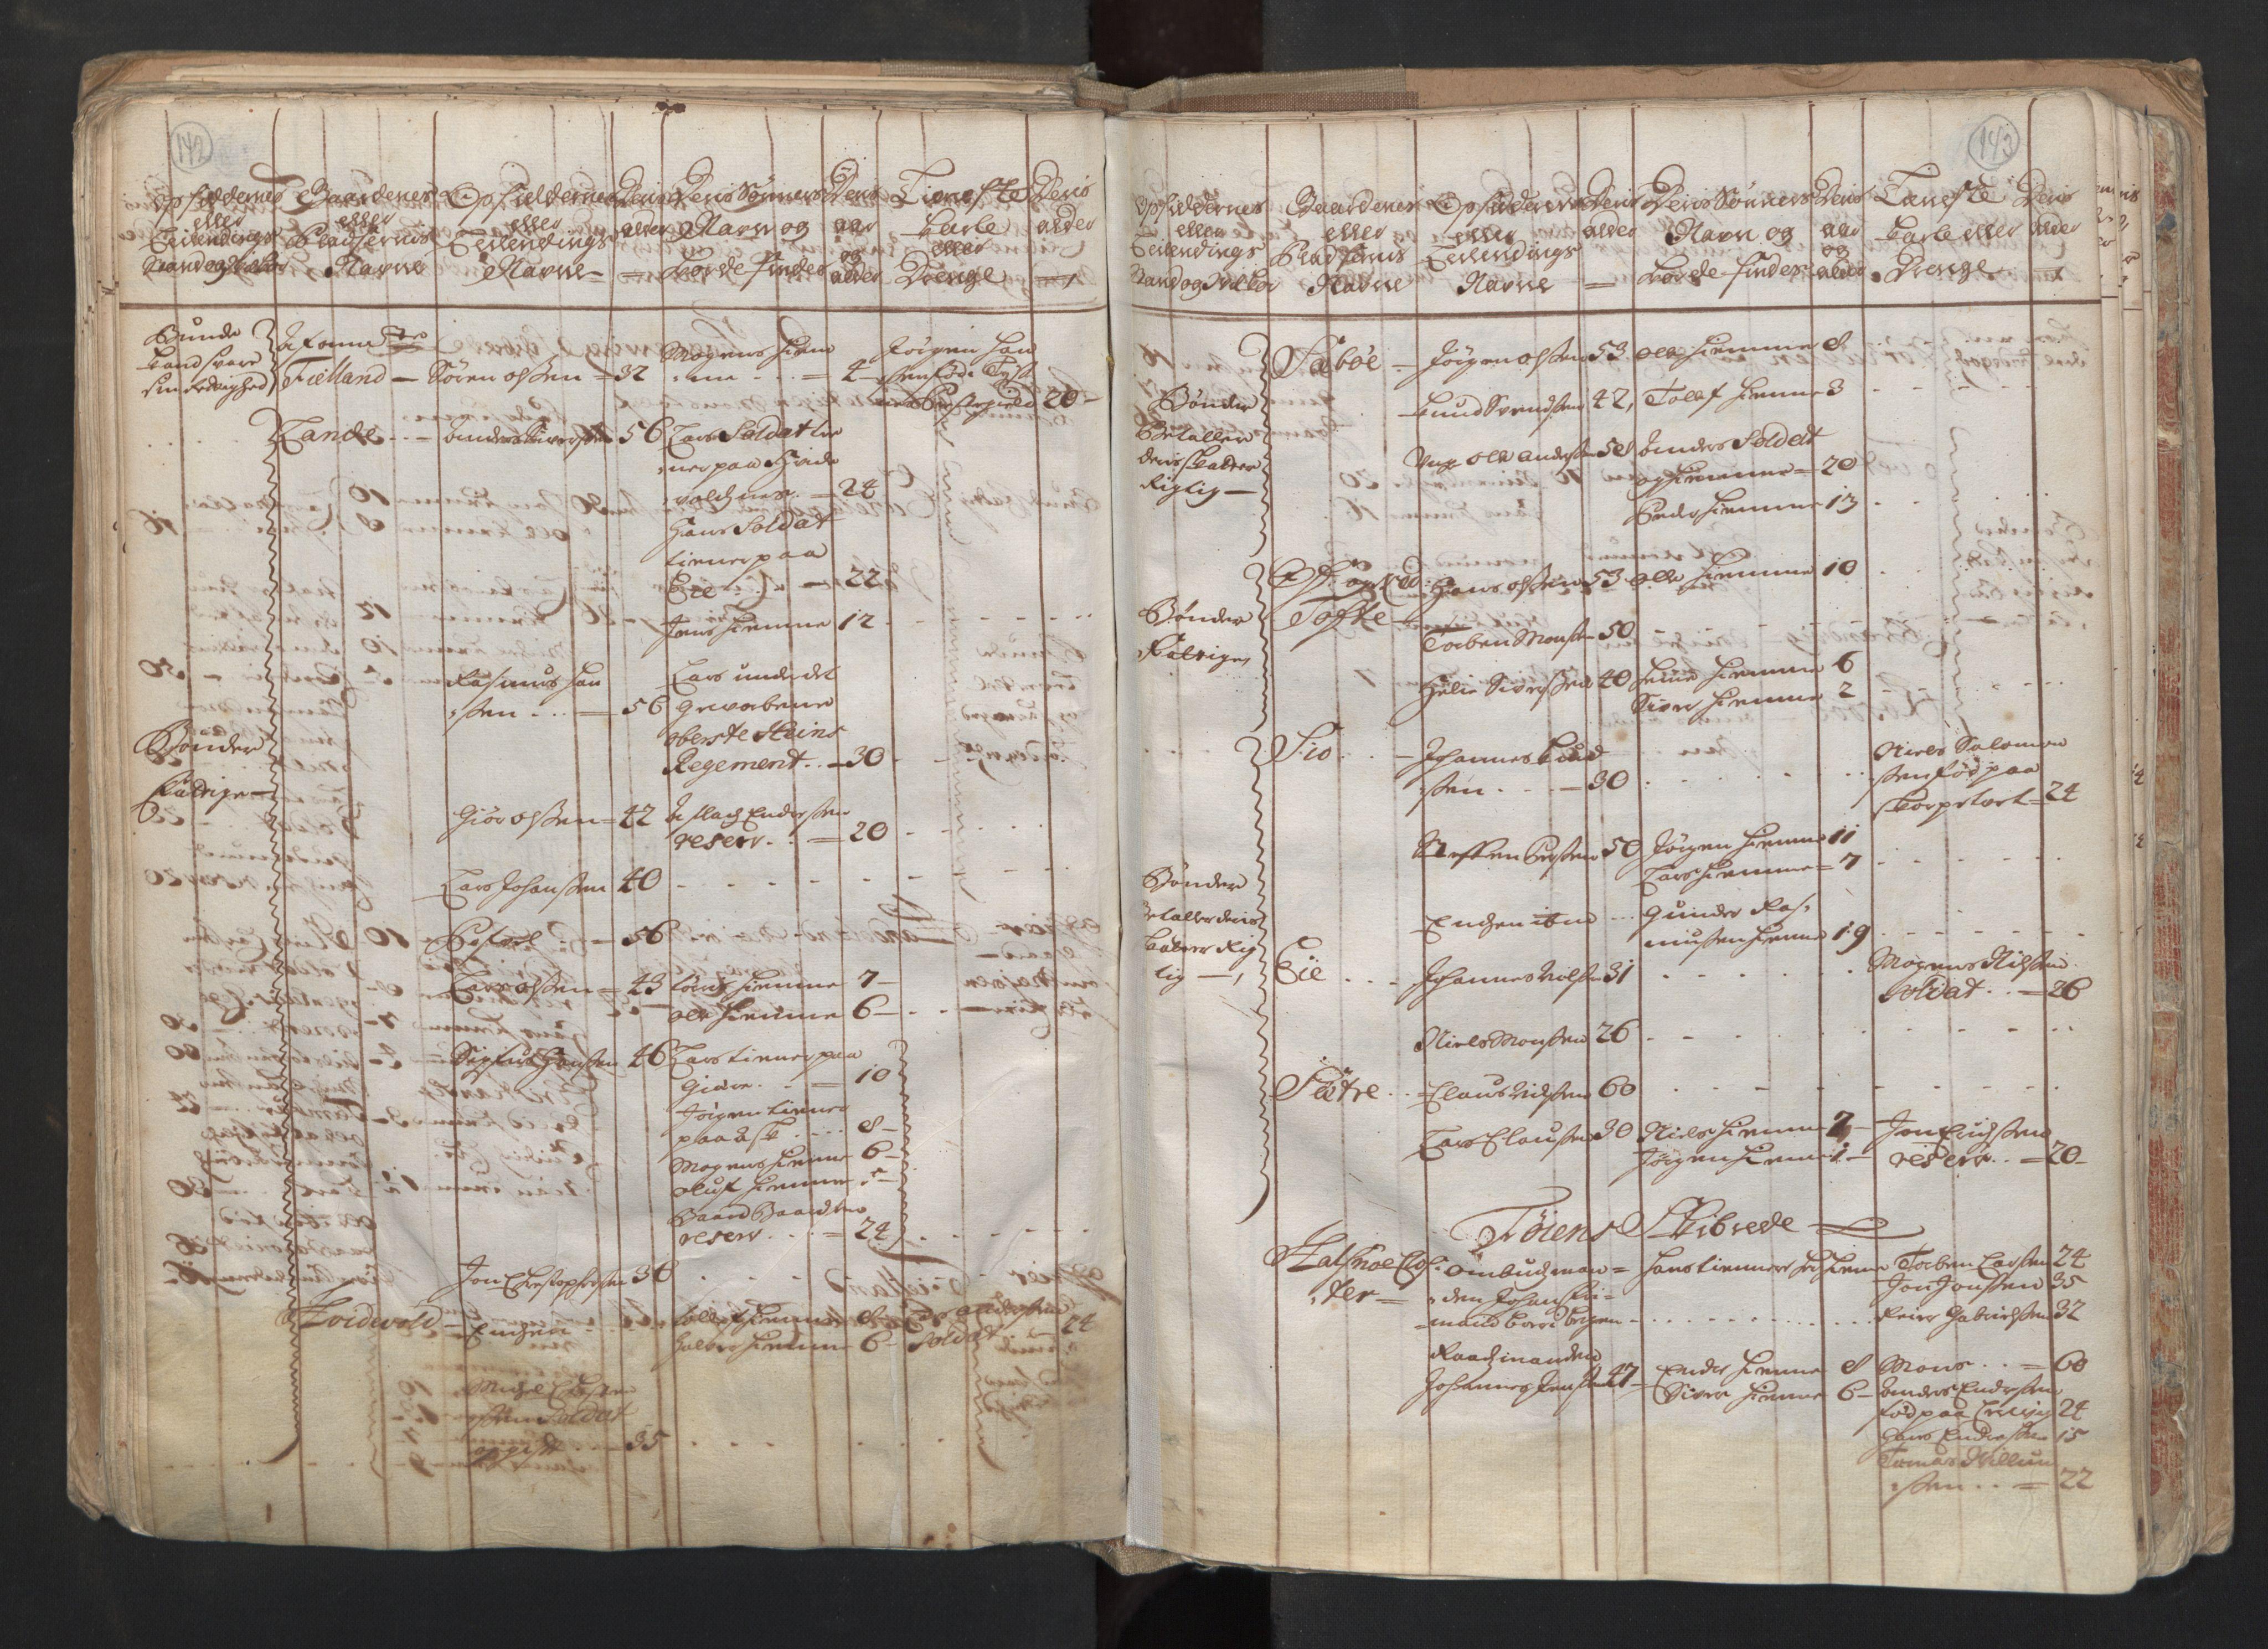 RA, Manntallet 1701, nr. 6: Sunnhordland fogderi og Hardanger fogderi, 1701, s. 142-143